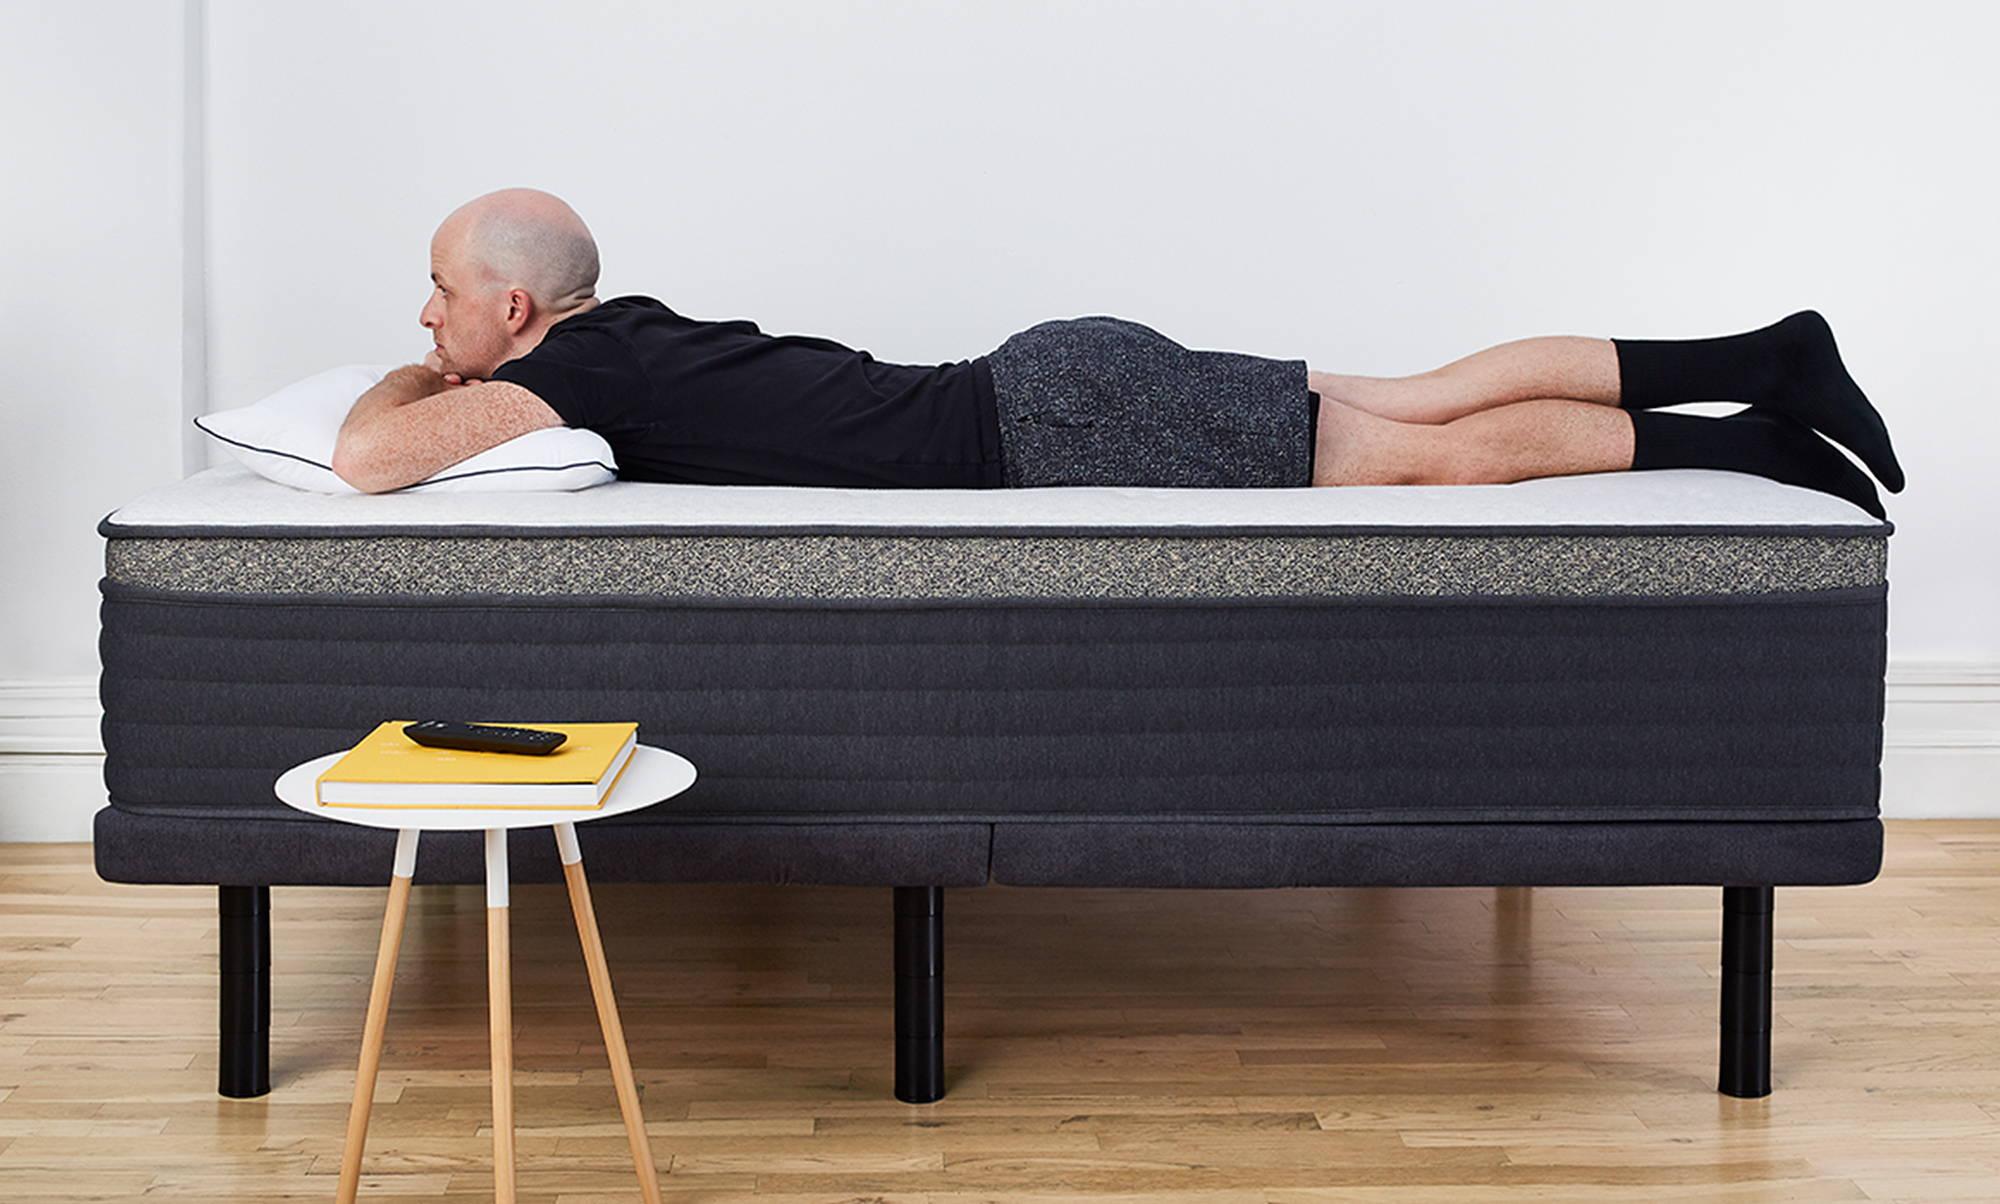 Man laying on Helix mattress on top of Helix Adjustable Base